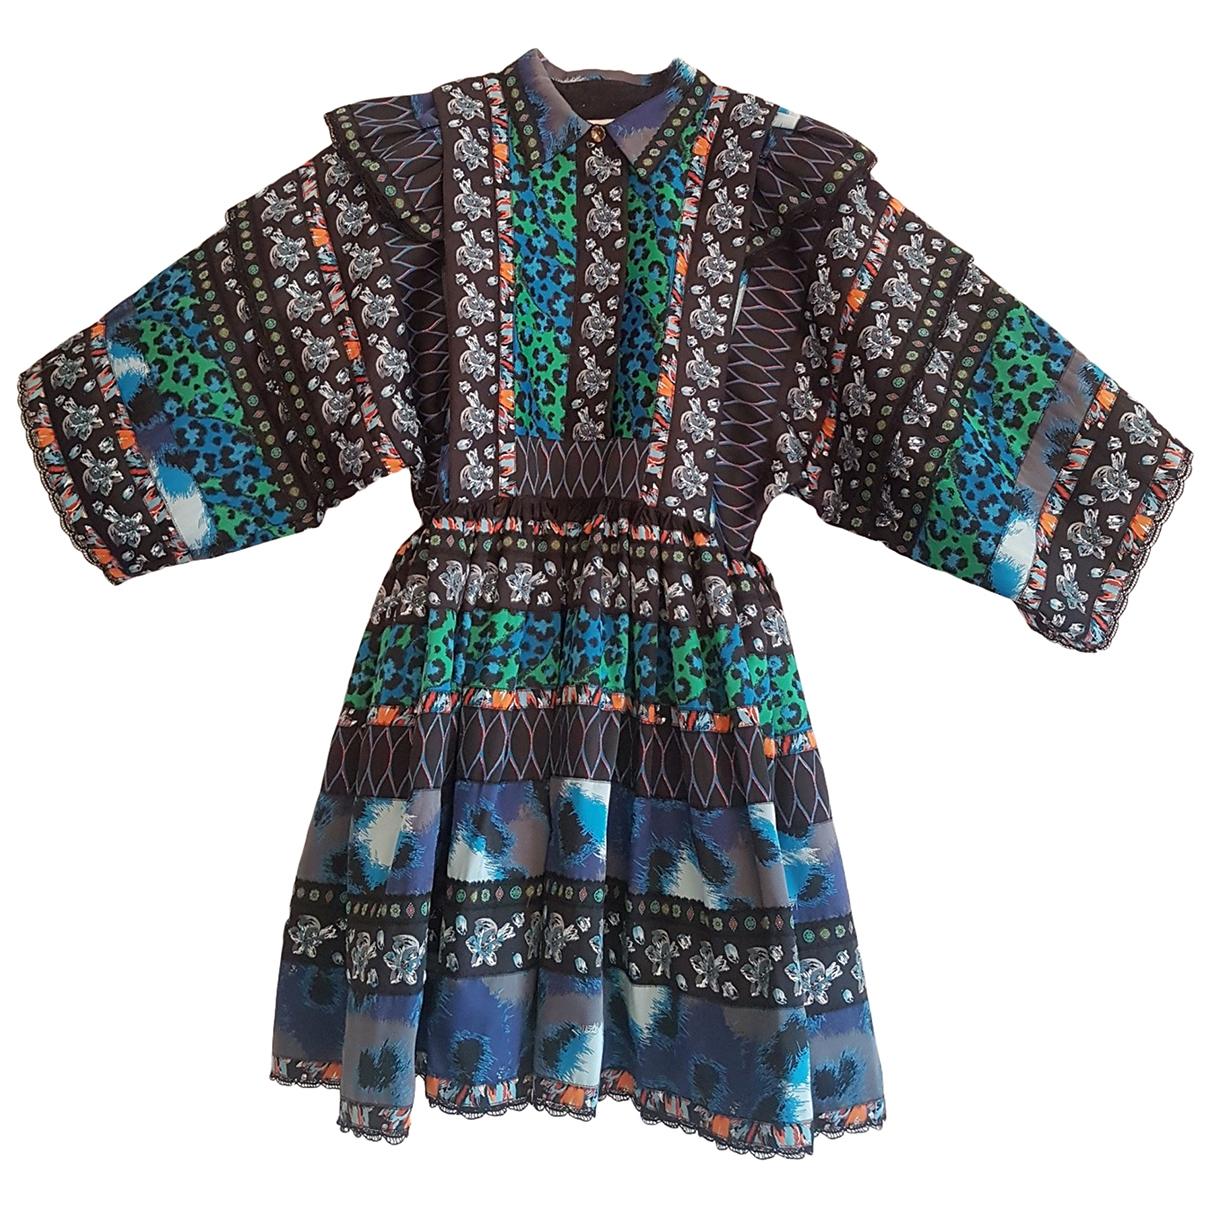 Kenzo X H&m \N Blue dress for Women 36 FR